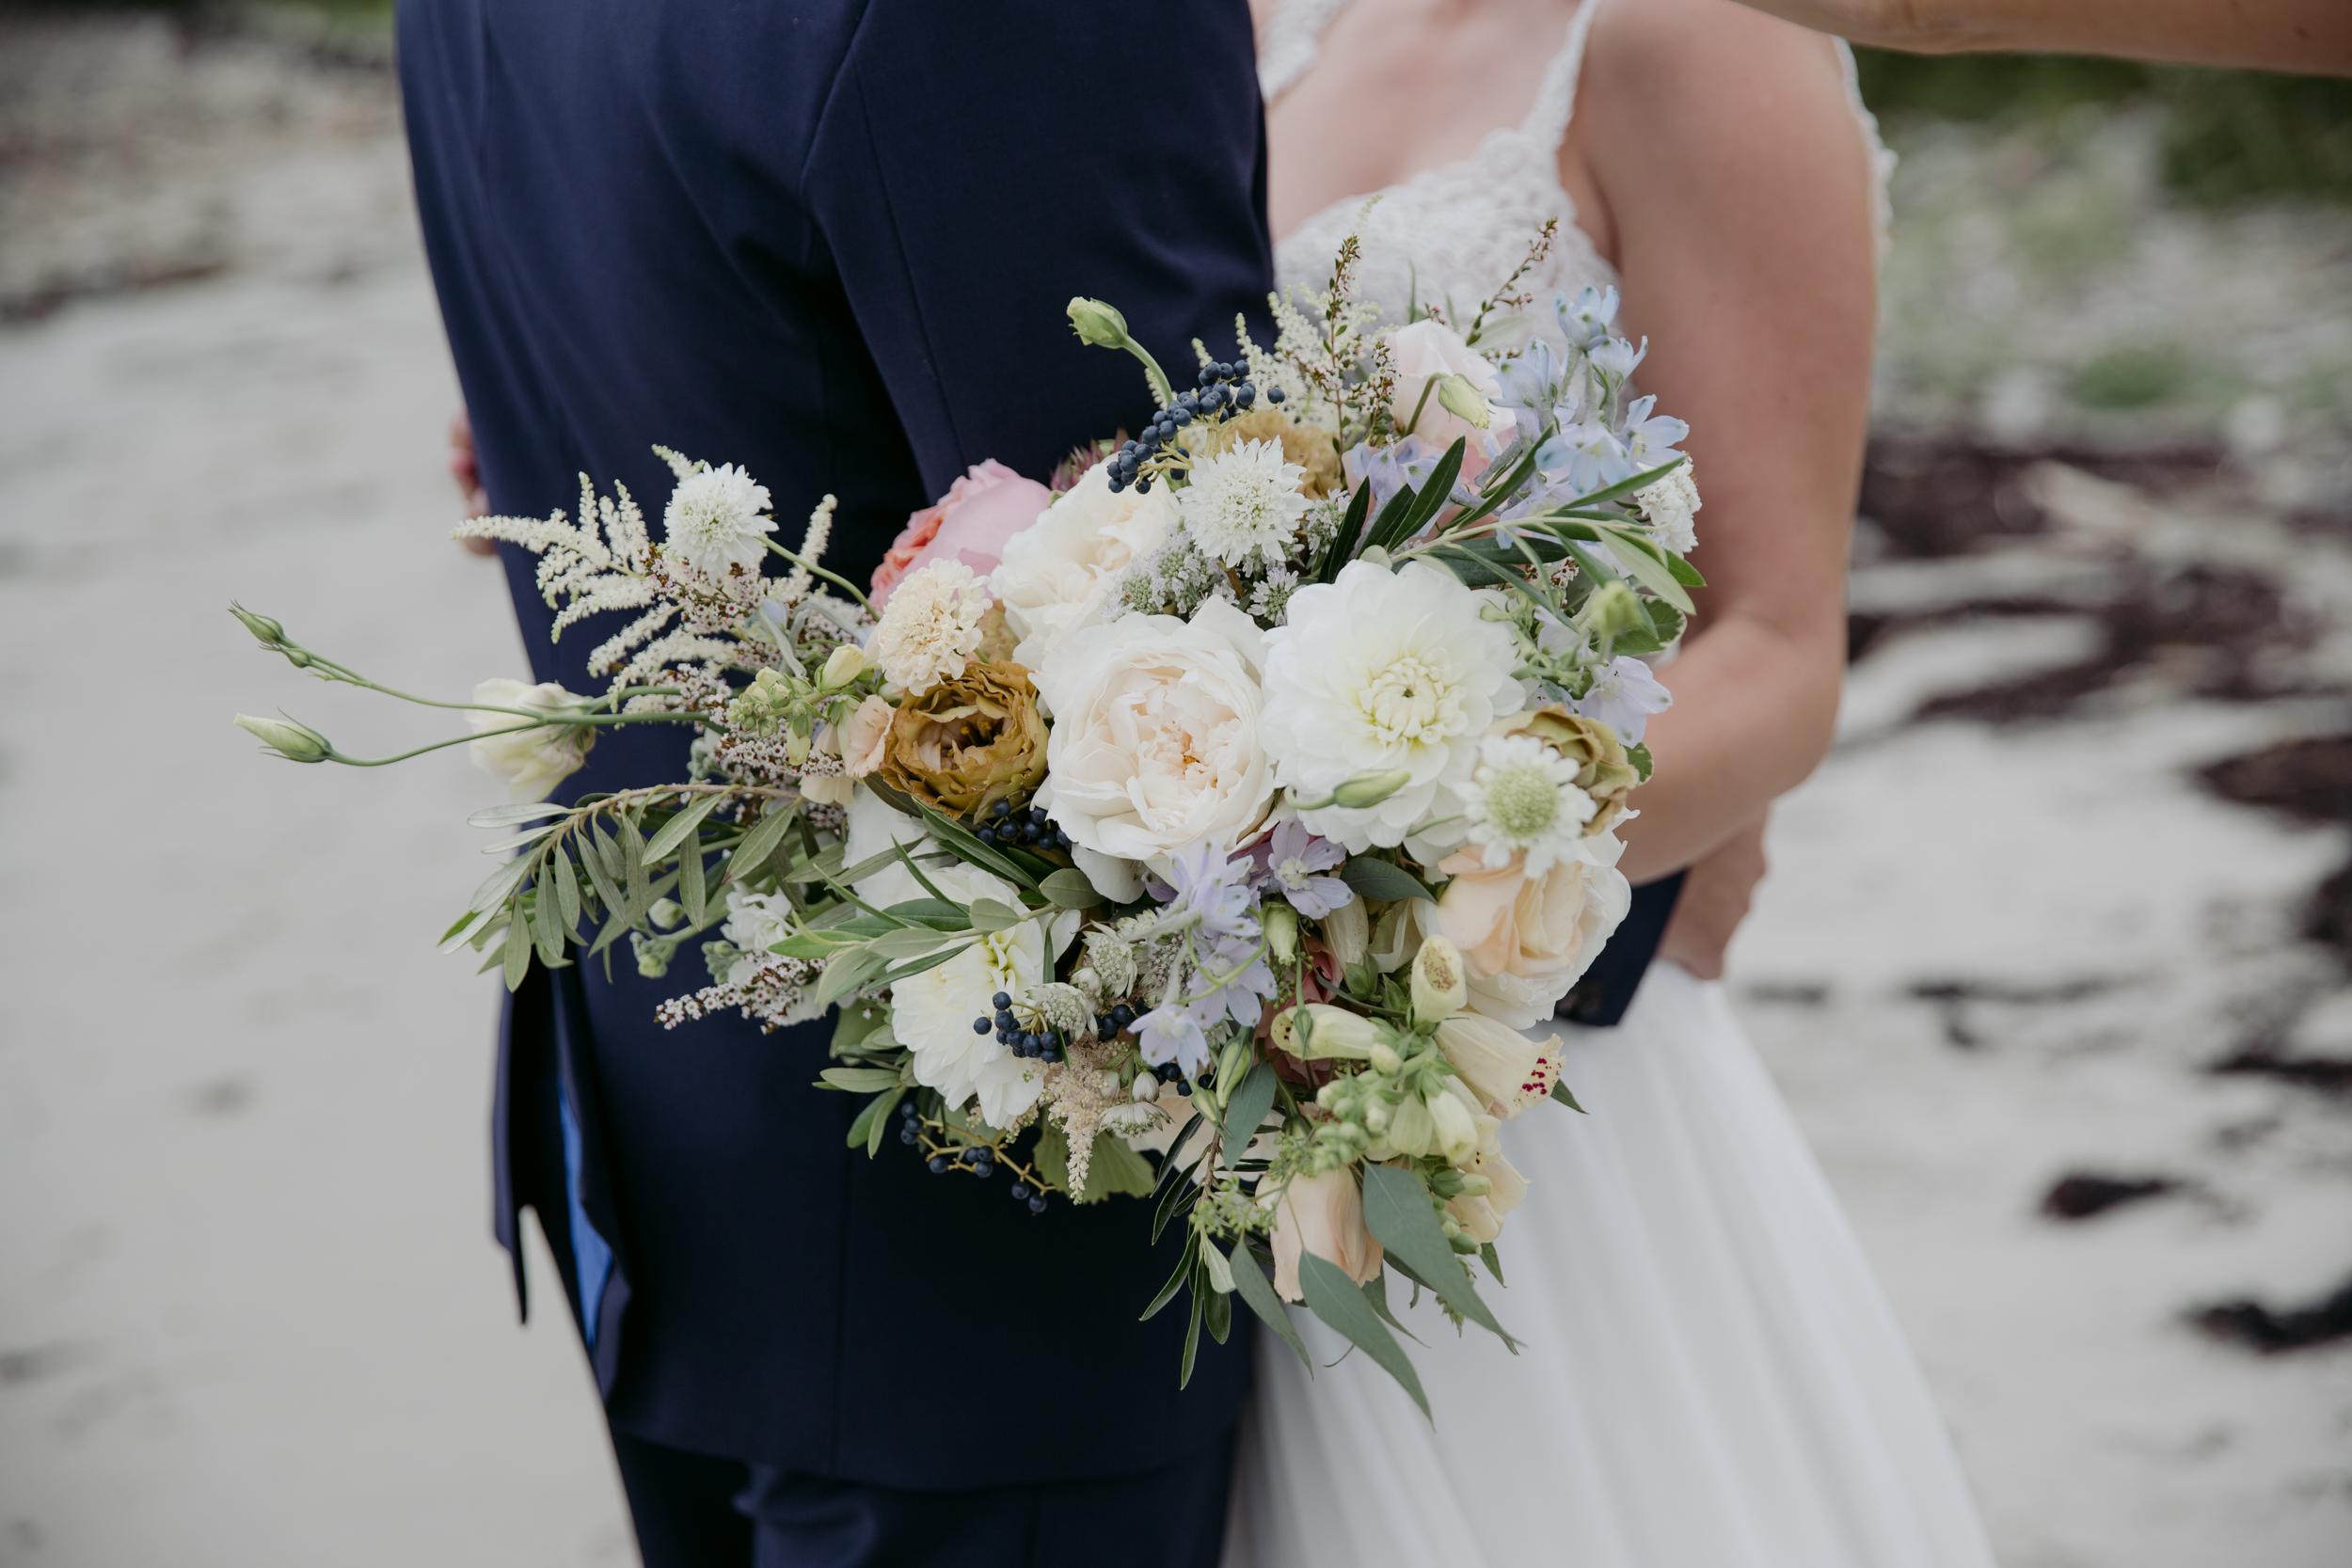 point_lookout_northport_Maine_Midcoast_wedding_leslie_justin-6.jpg